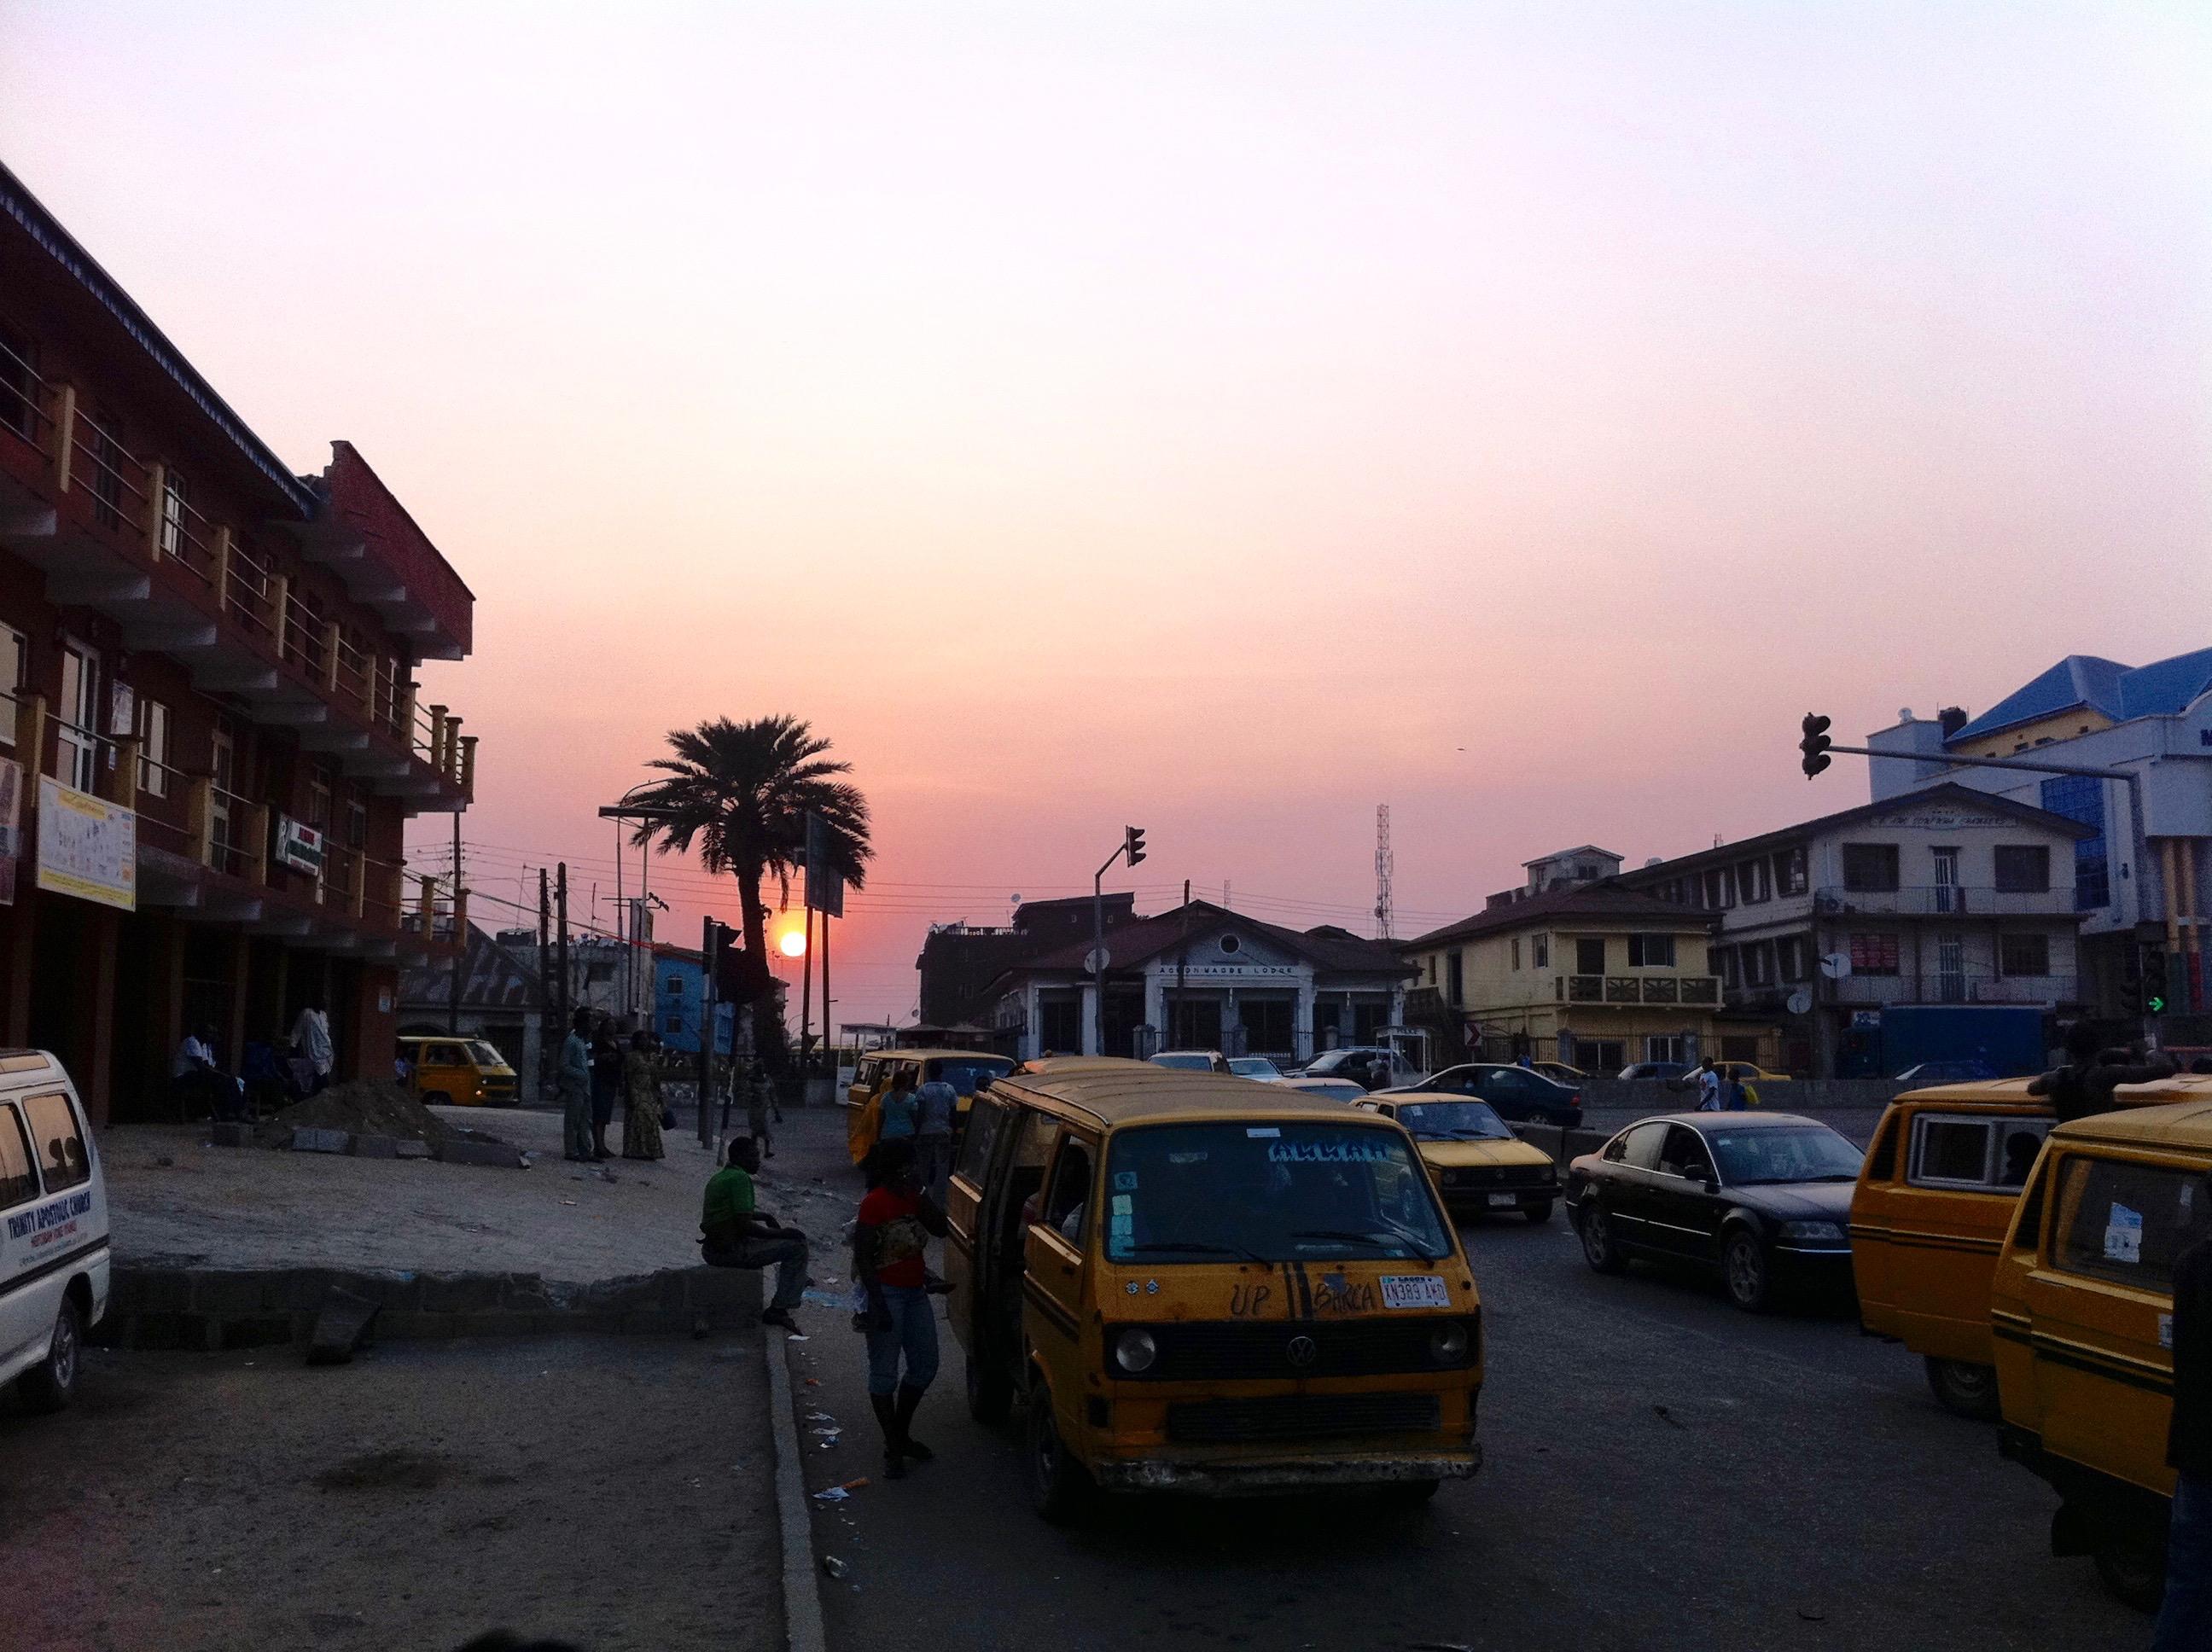 Sunset in Jibowu, Lagos, Nigeria. #JujuFilms